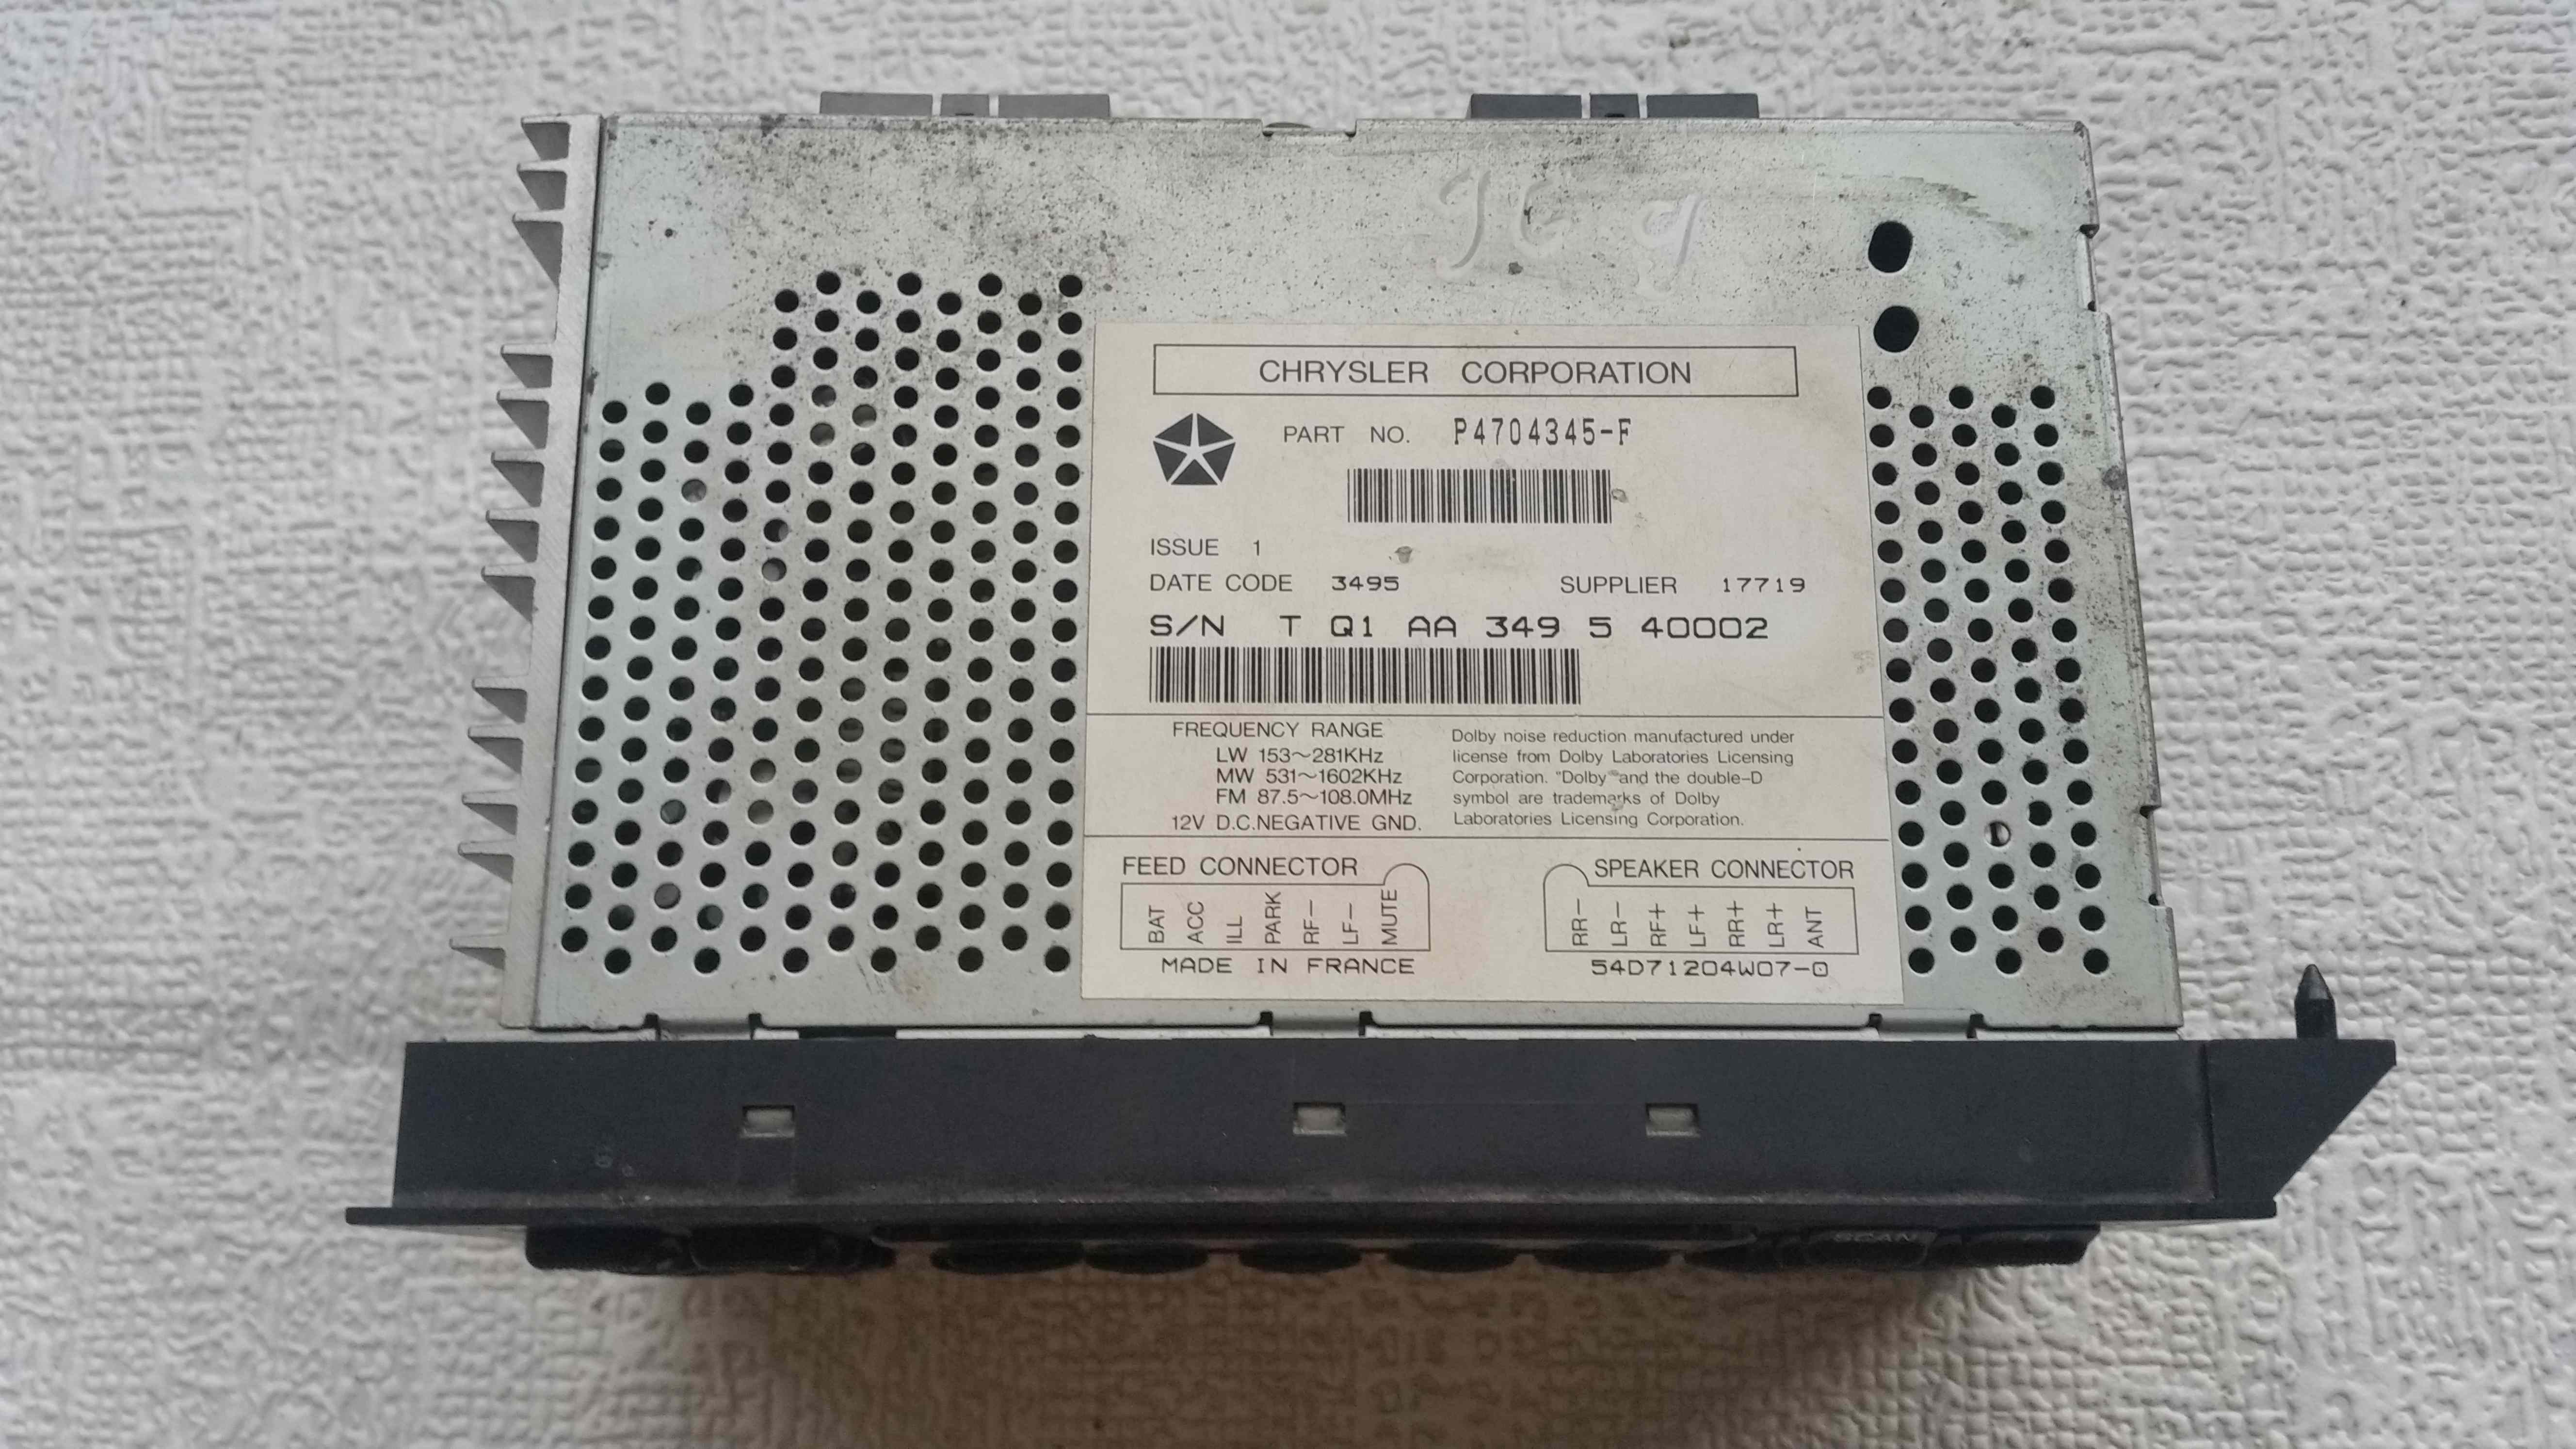 Chrysler voyager 96 00 radio cassette player head unit p4704345 f chrysler voyager 96 00 radio cassette player head unit p4704345 f article p4704345 f biocorpaavc